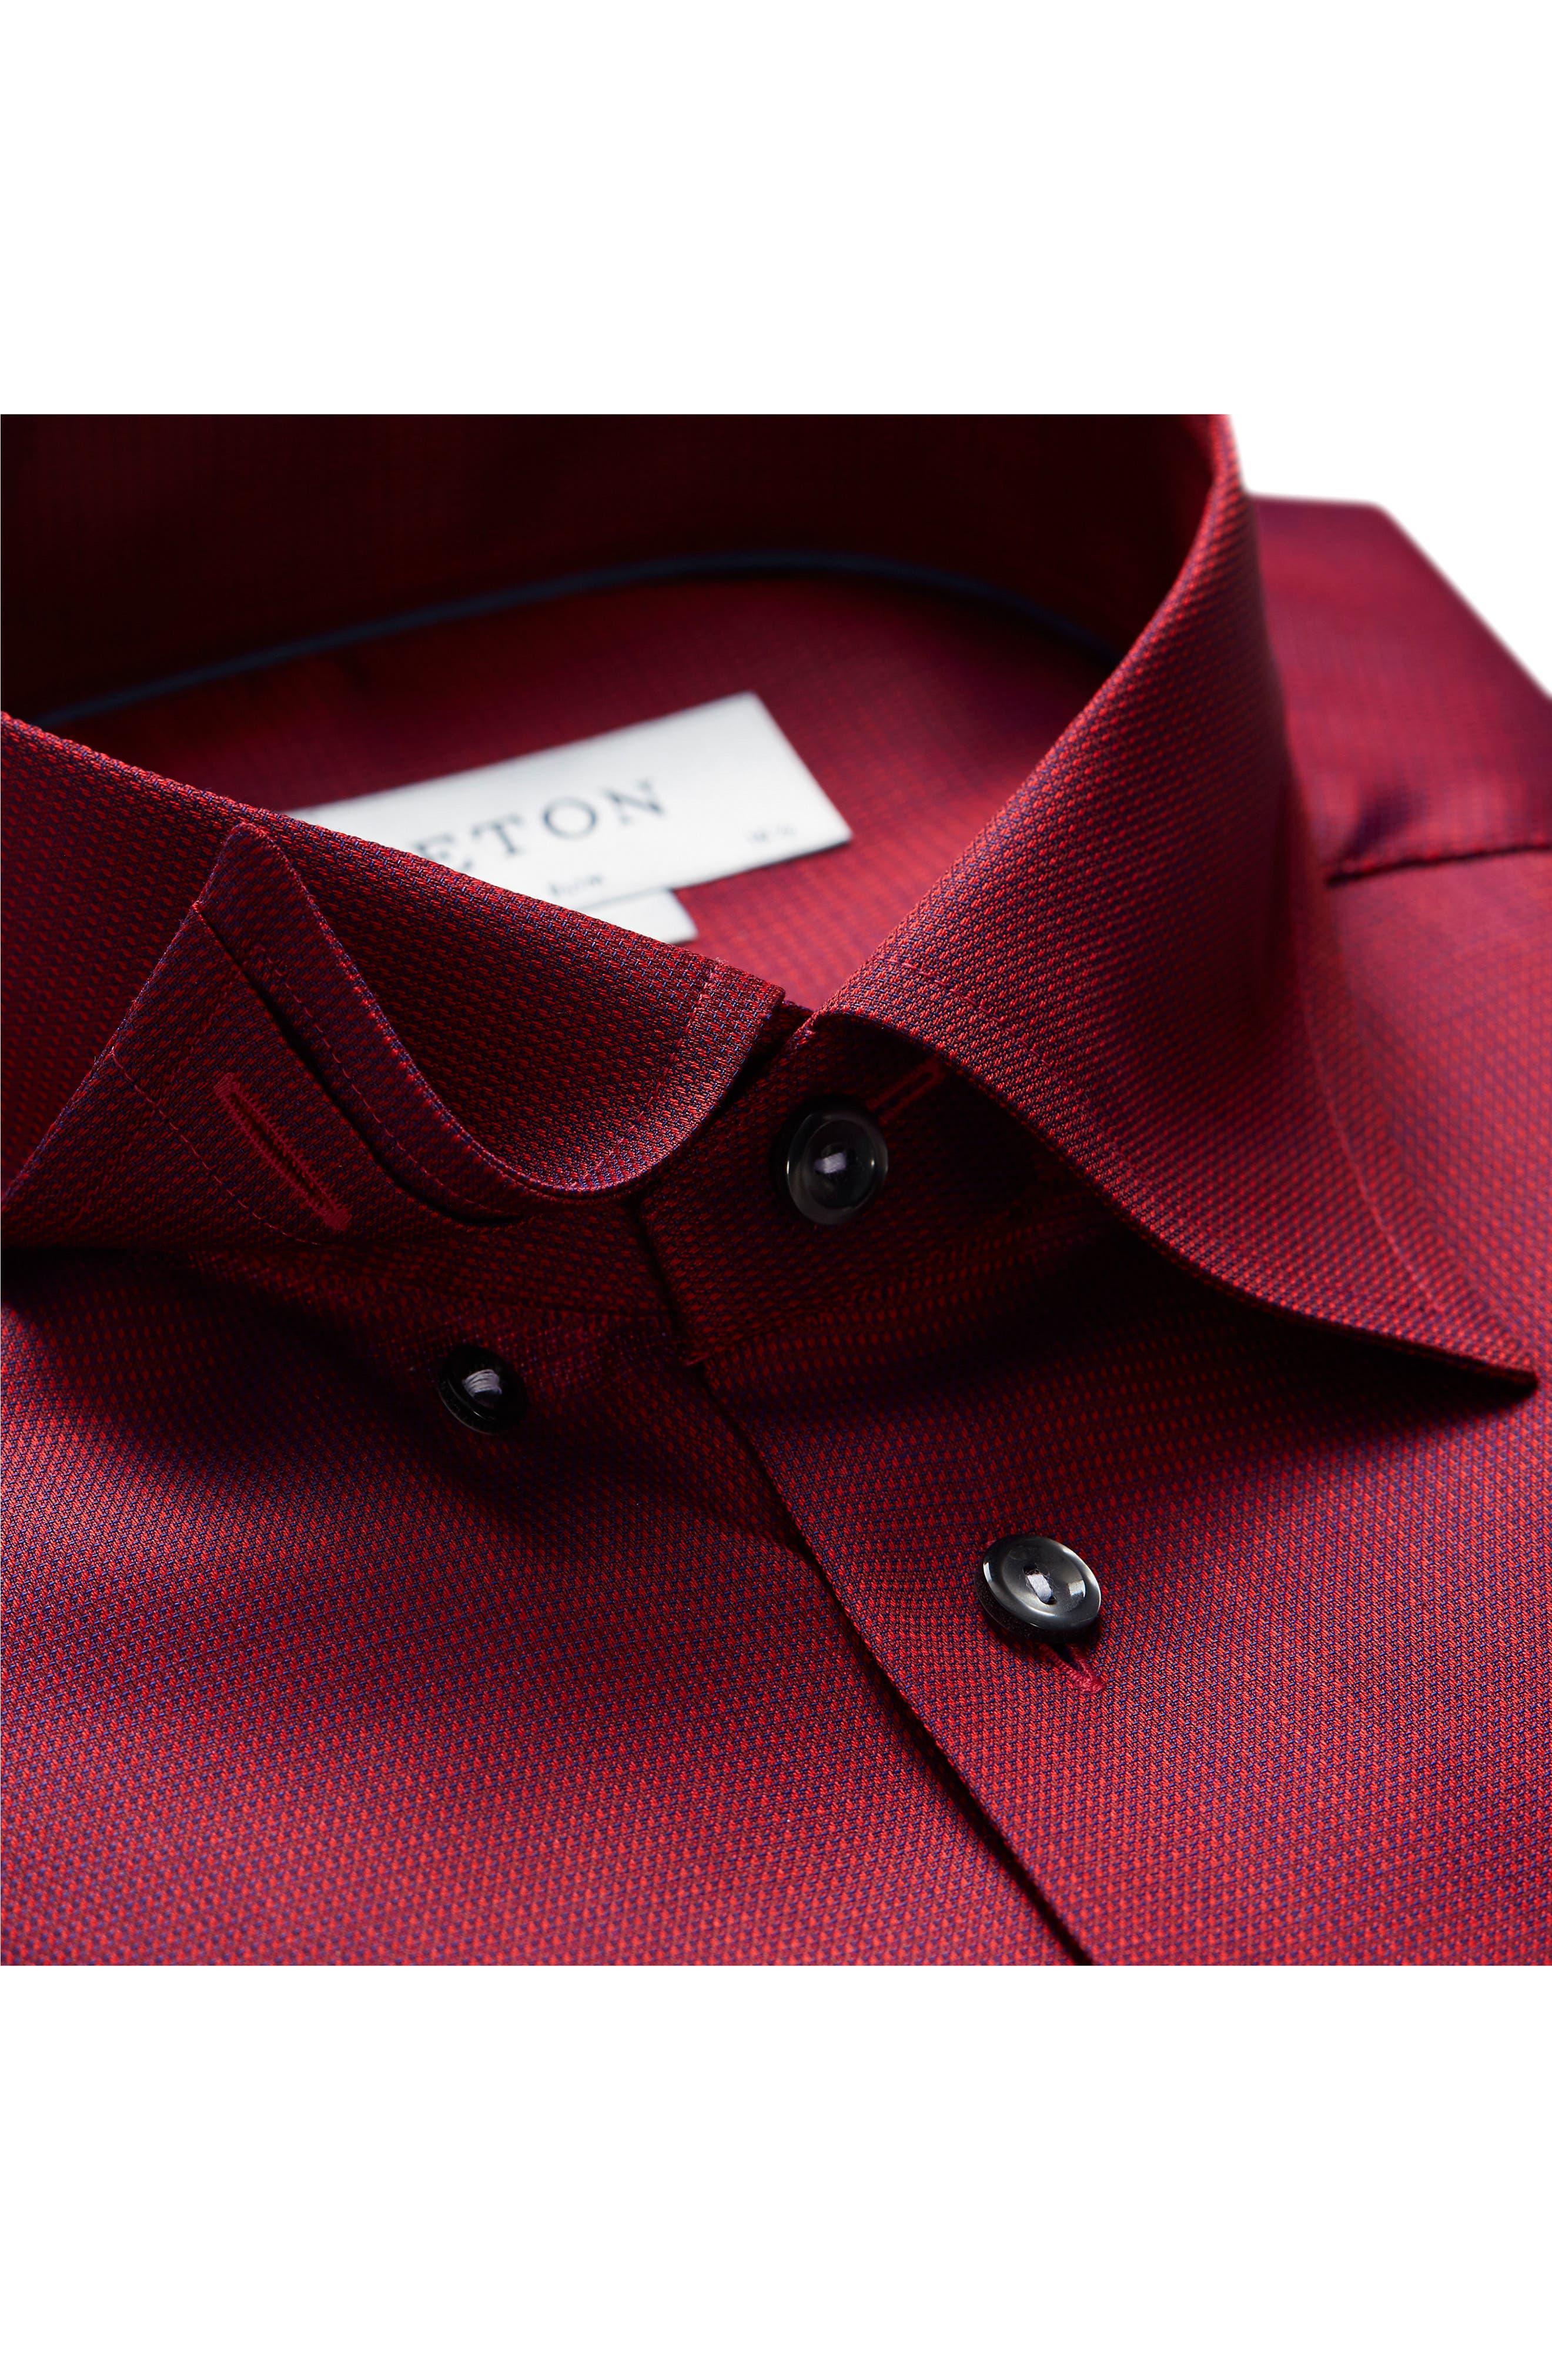 Slim Fit Solid Dress Shirt,                             Alternate thumbnail 3, color,                             600